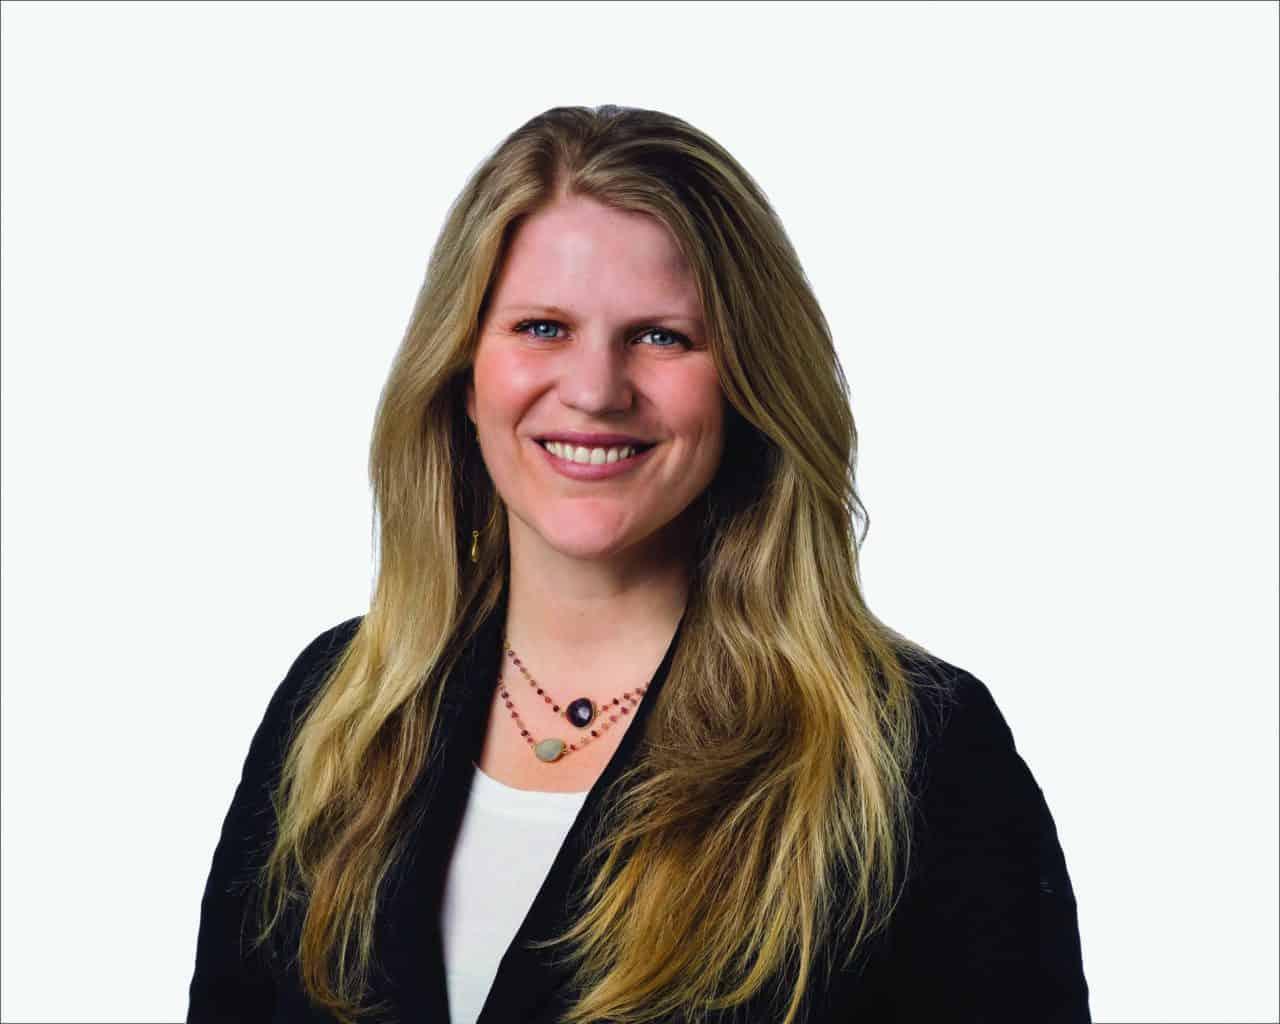 Headshot of Executive Clinical Director Dr. Chantelle Thomas